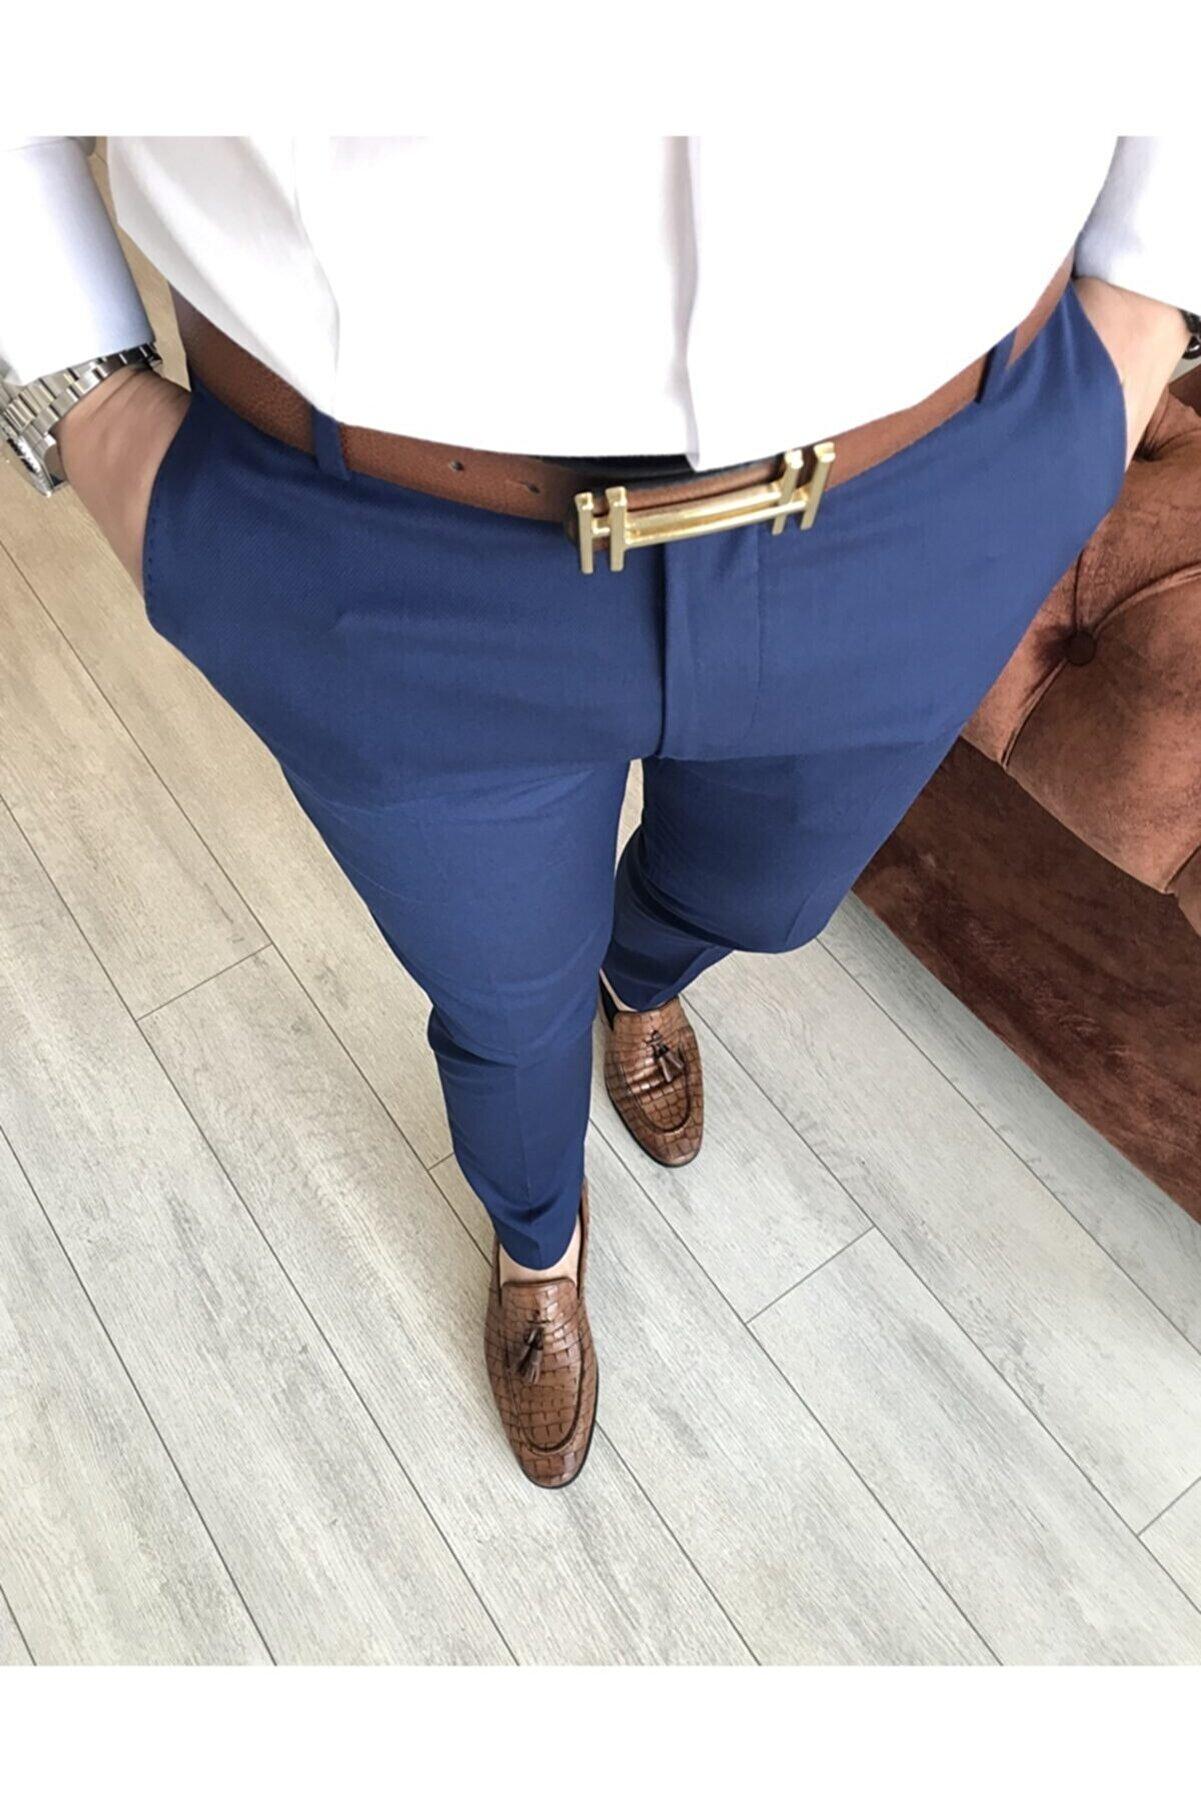 TerziAdemAltun Italyan Stil Slim Fit Erkek Kumaş Pantolon Açık Lacivert T4828